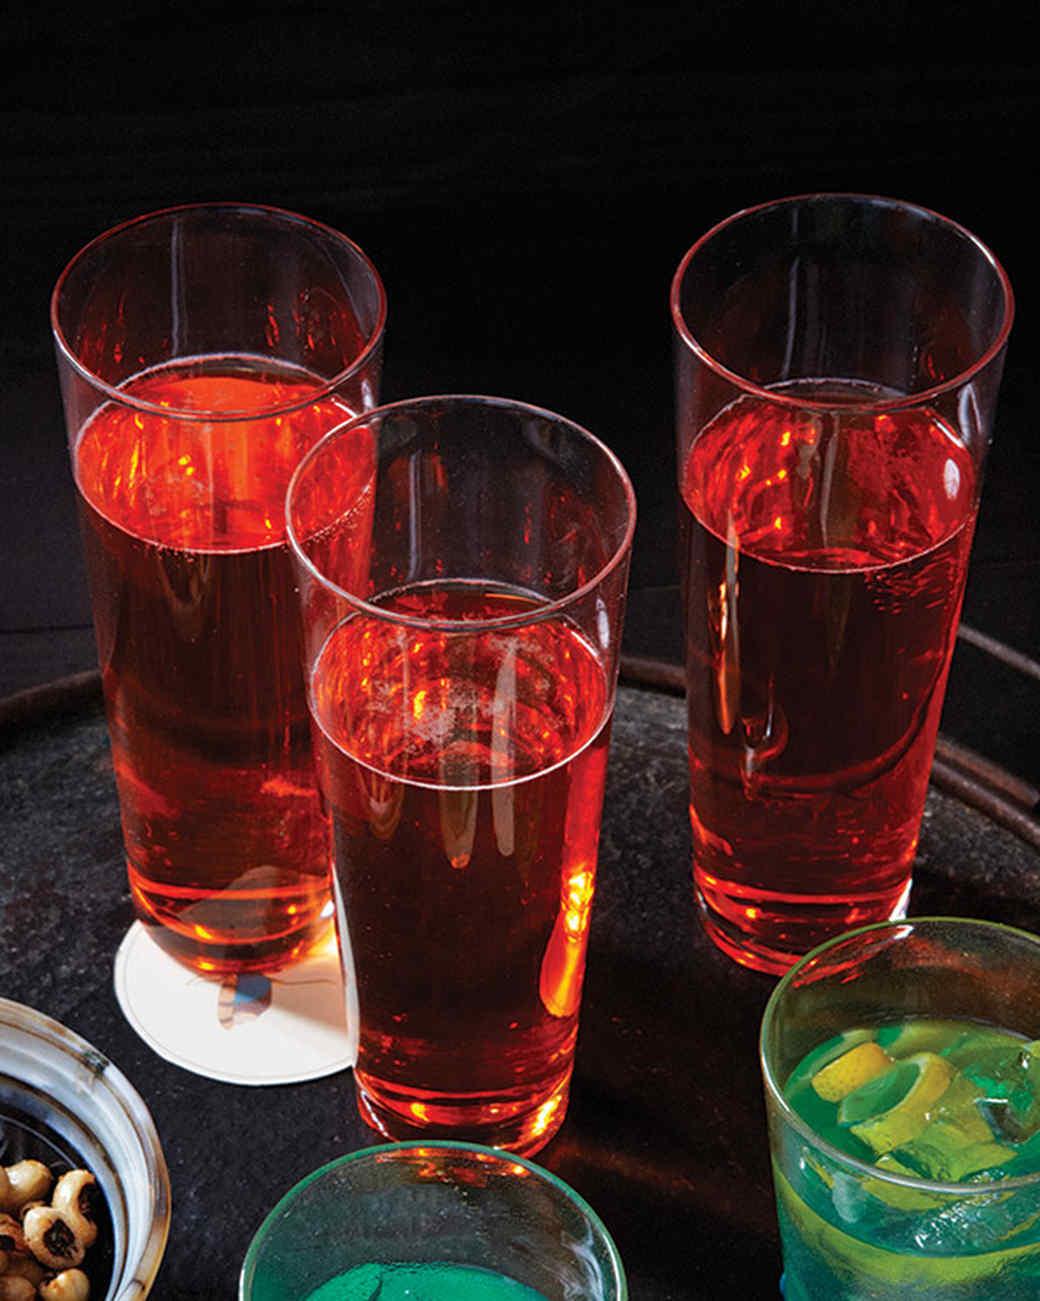 md106062_1010_msl_sw_halloween_0318_red_drinks.jpg